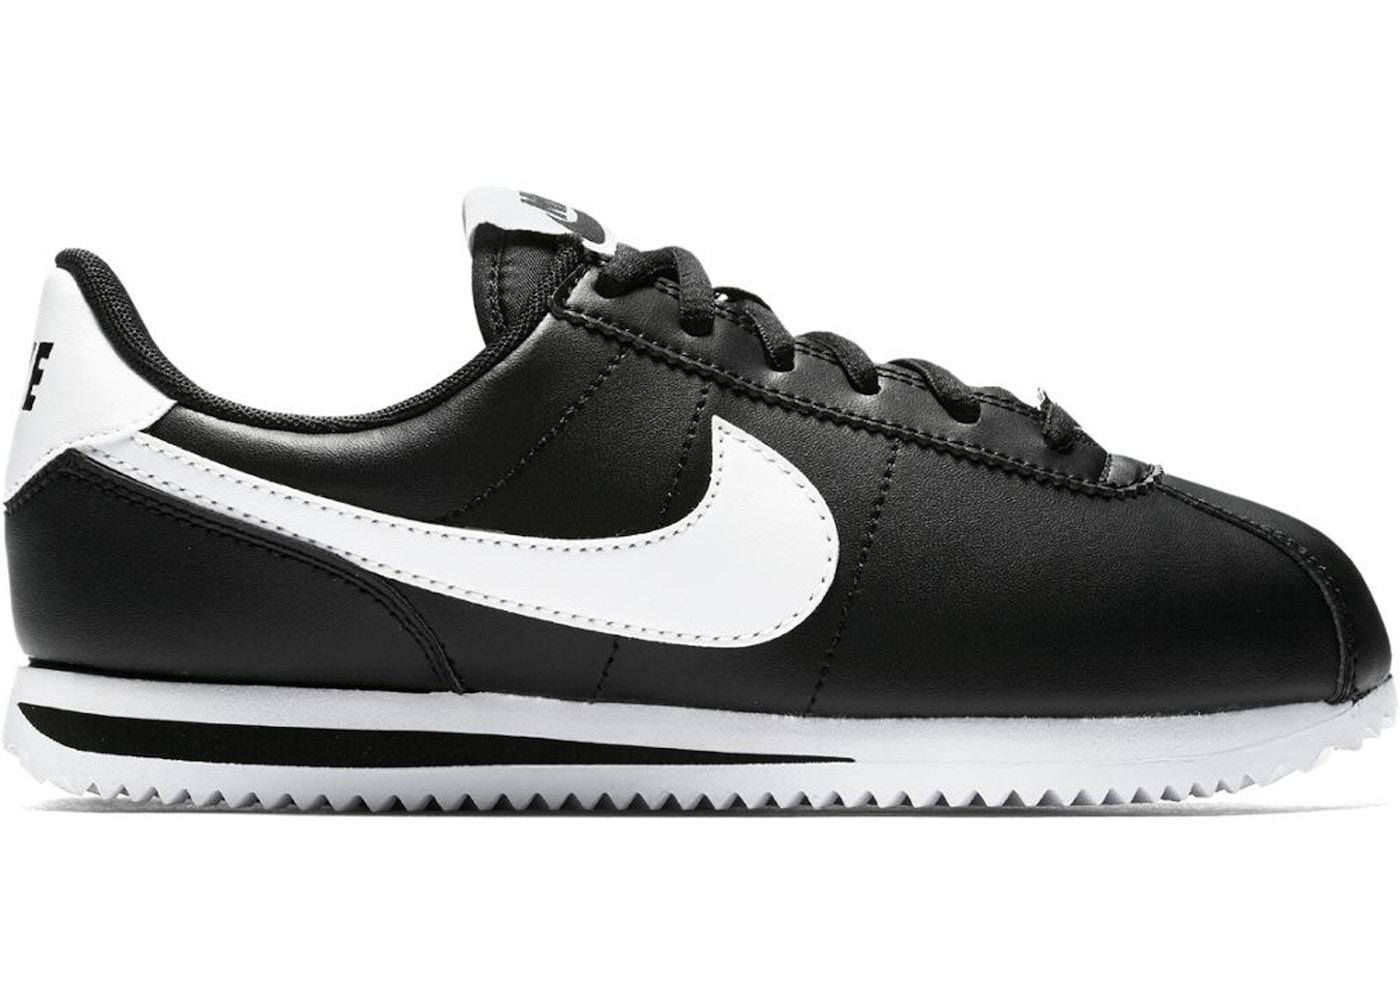 meet 0c85f a167b Nike Cortez Basic Leather Black White (GS)